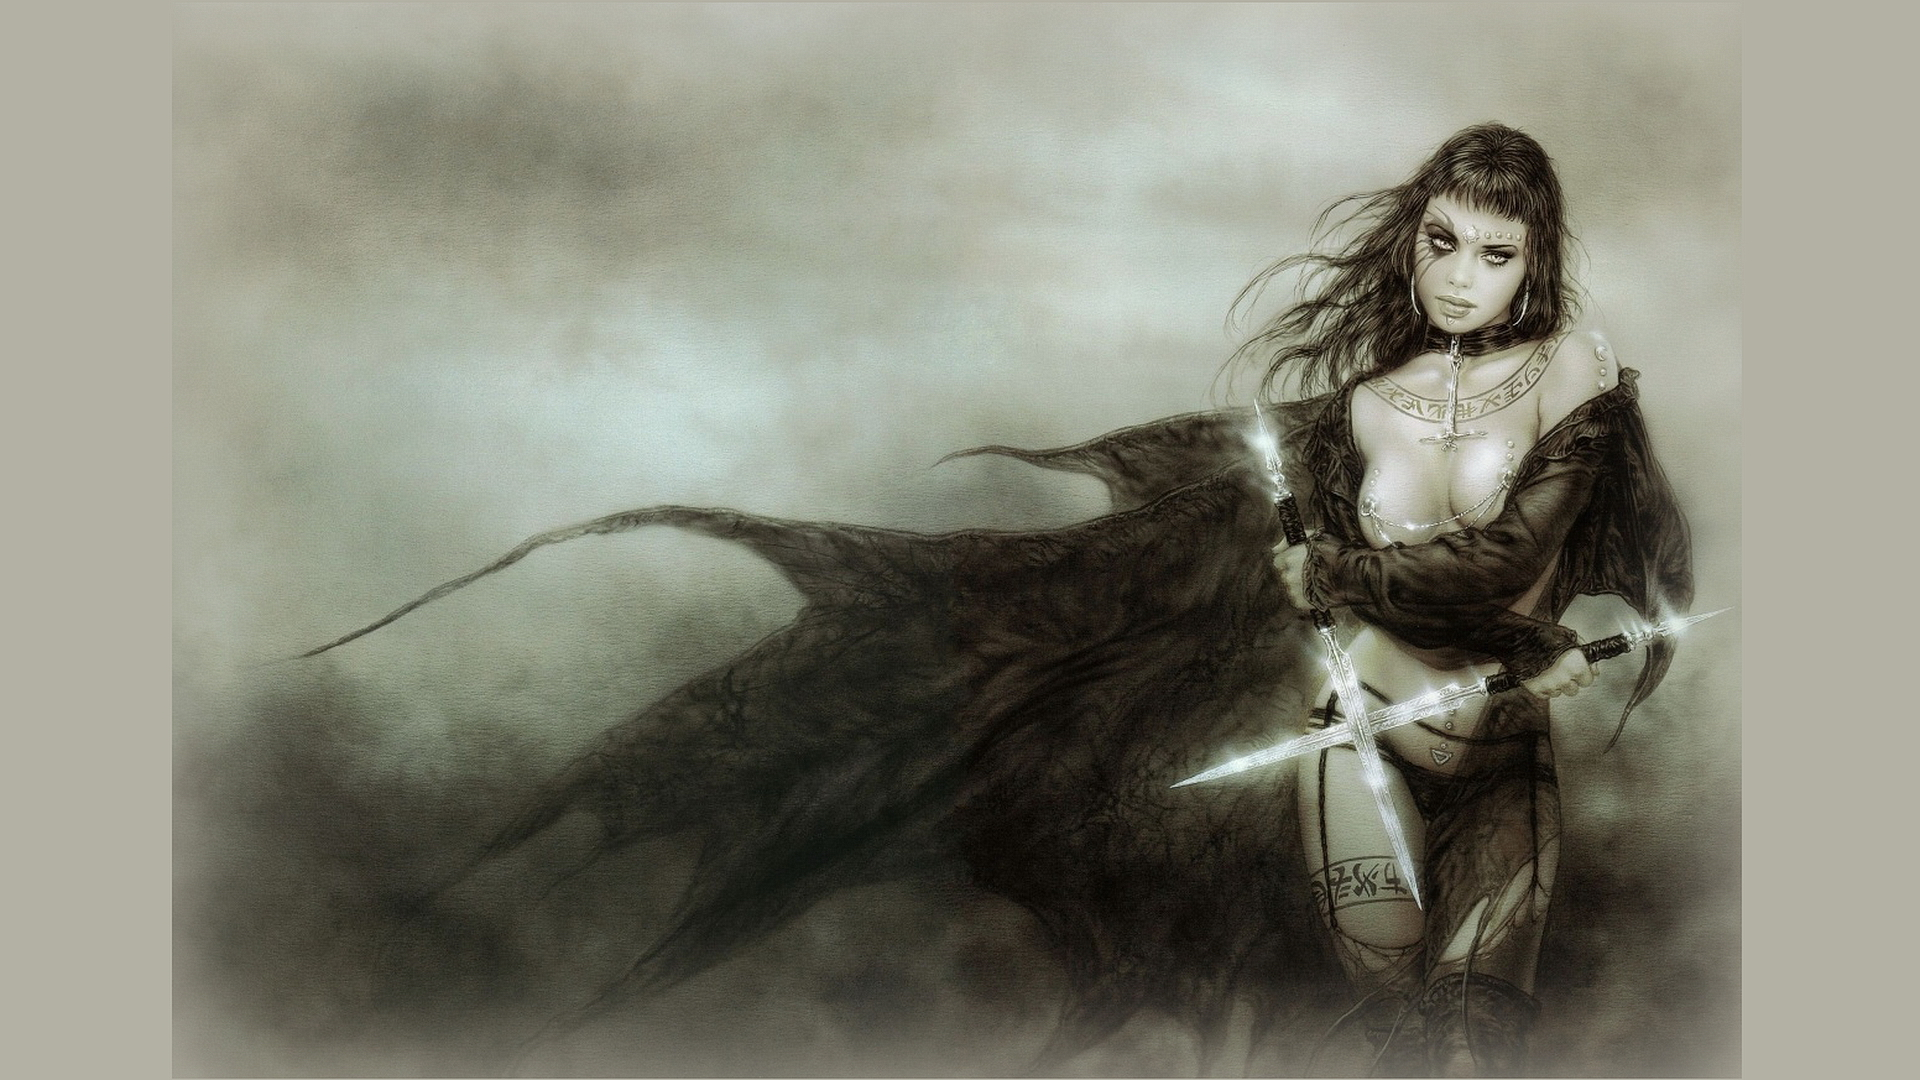 Gothic warrior women cartoon photo